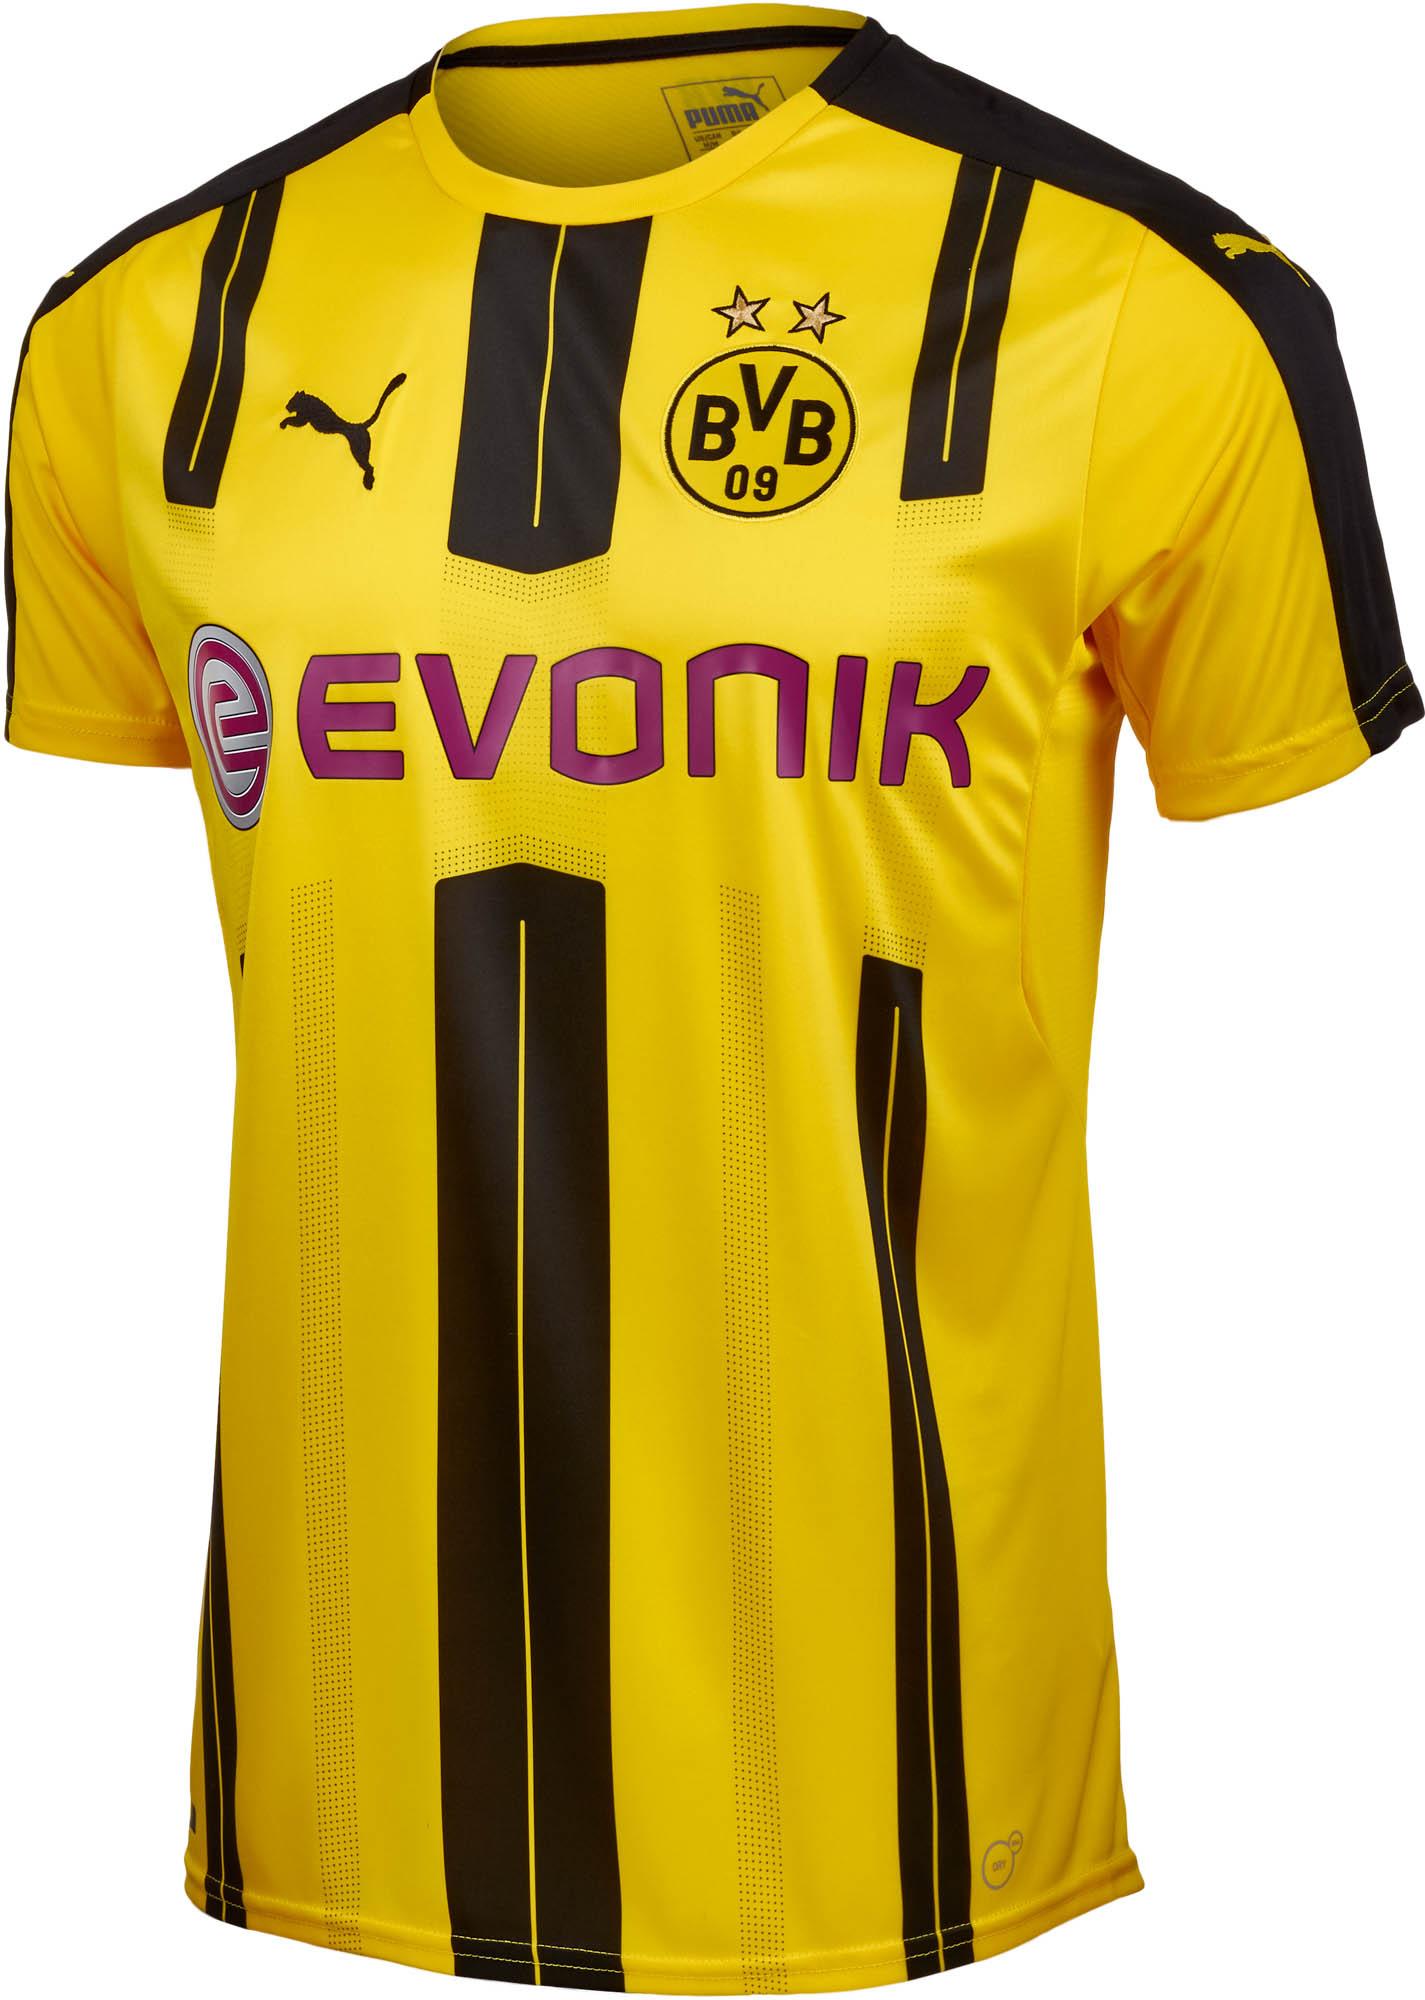 7dcf2fd34 Puma Borussia Dortmund Home Jersey - 2016 Dortmund Soccer Jerseys